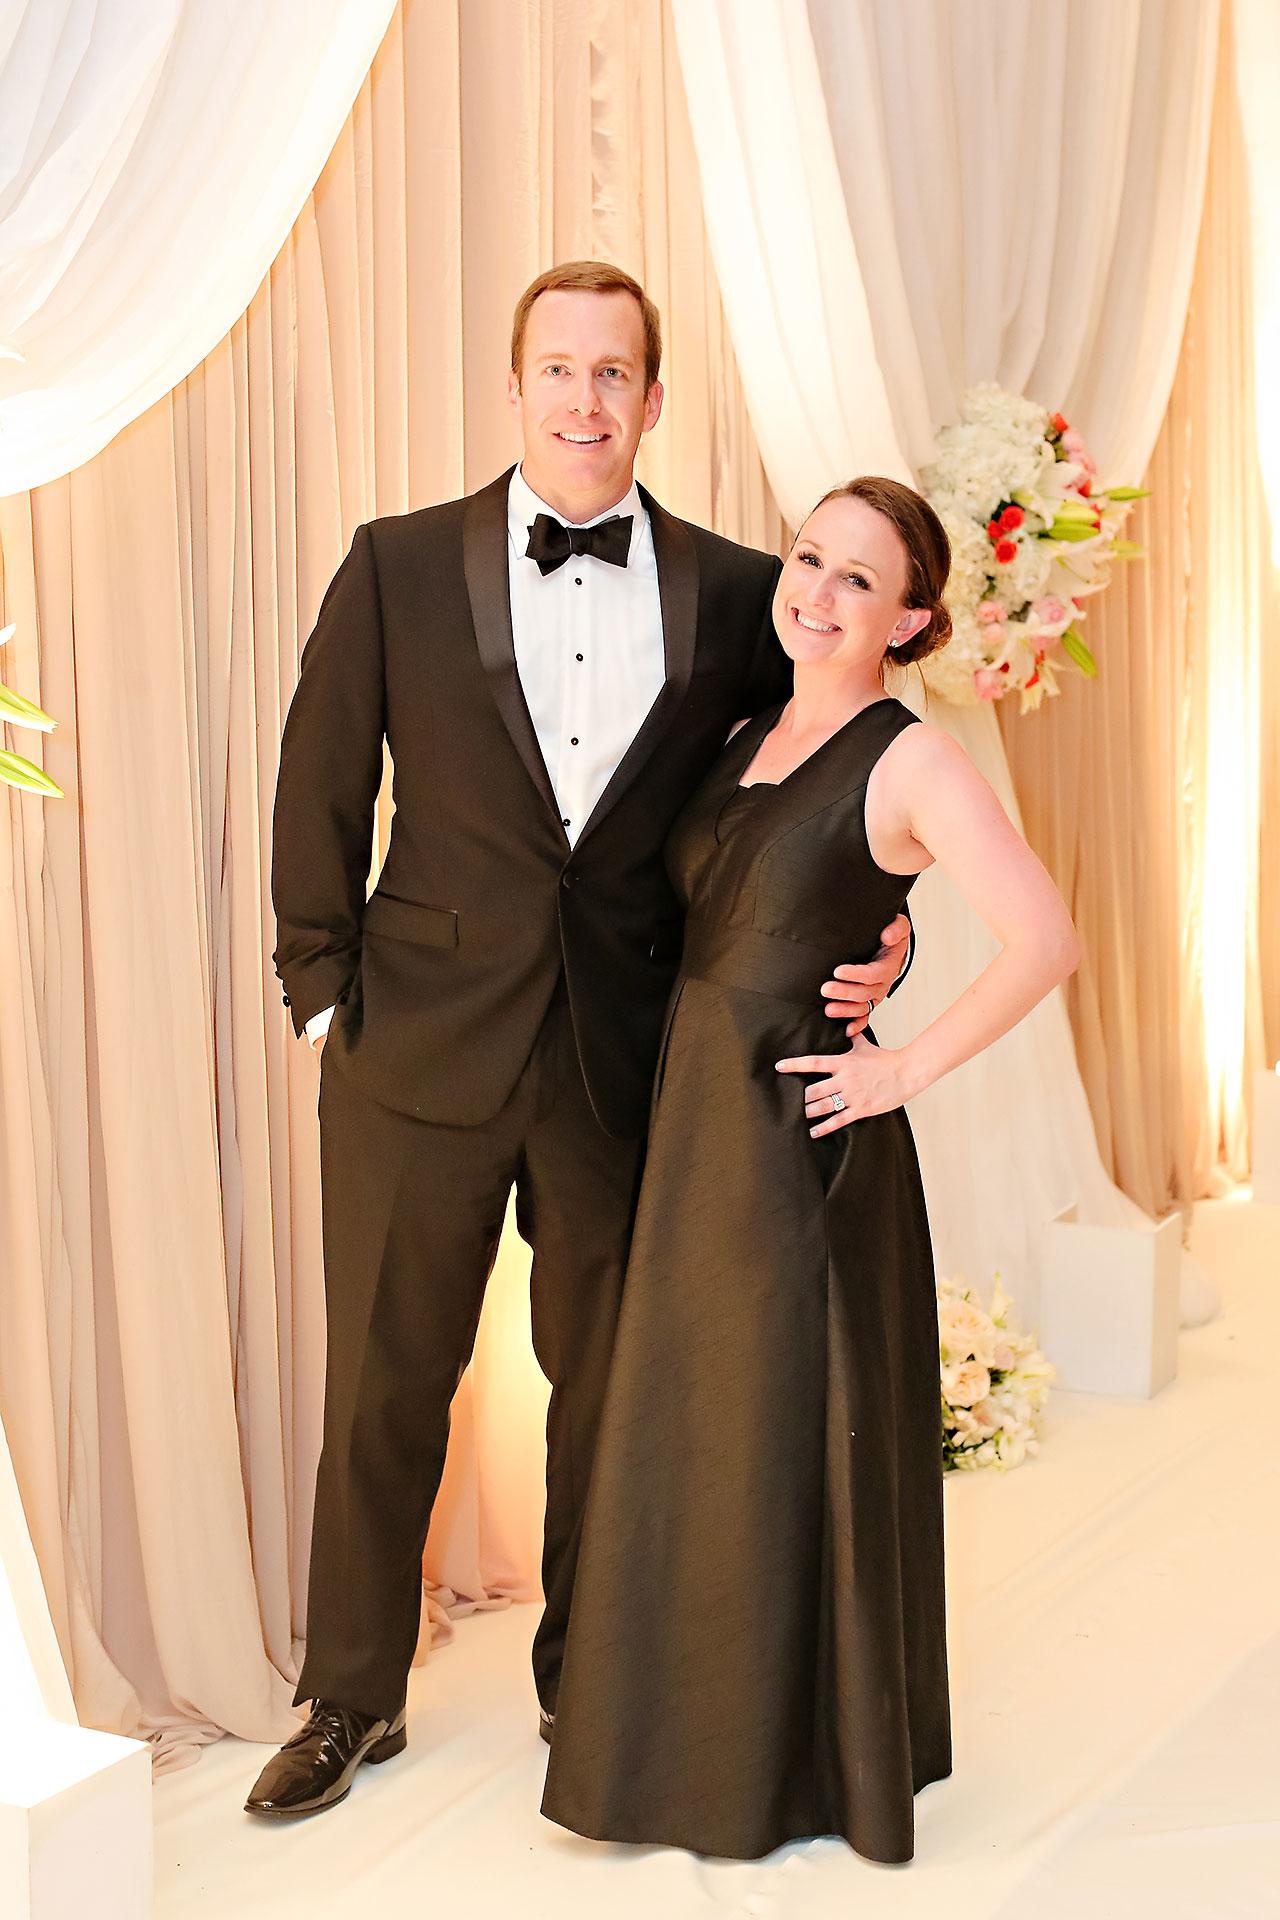 Joie Nikhil JW Marriott Indianapolis Wedding 227